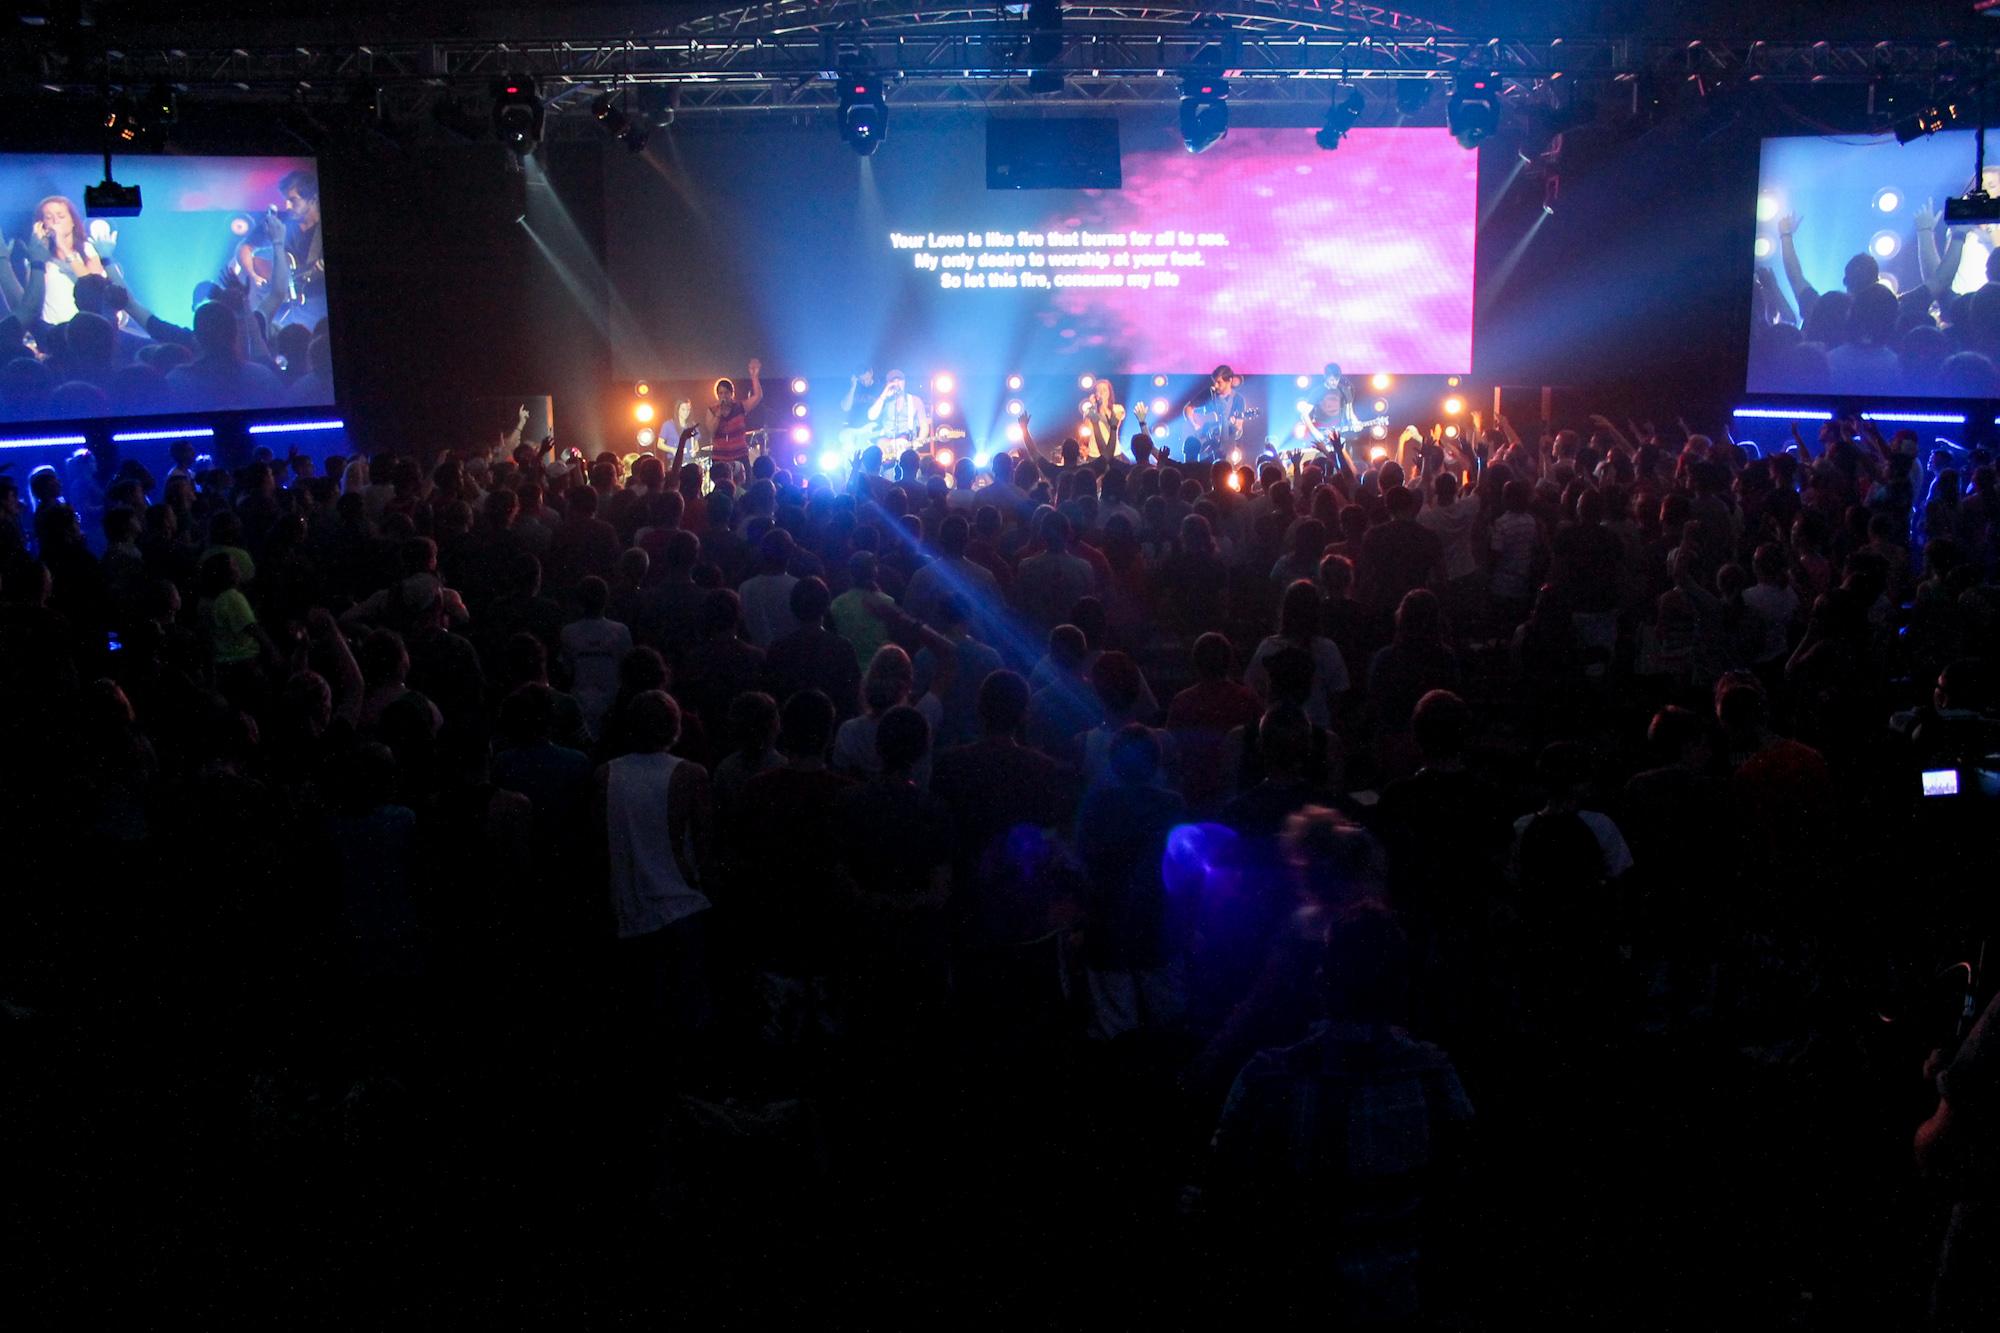 The Church at Polaris_Michiindoh Conference Center, Hillsdale, MI_2.jpg